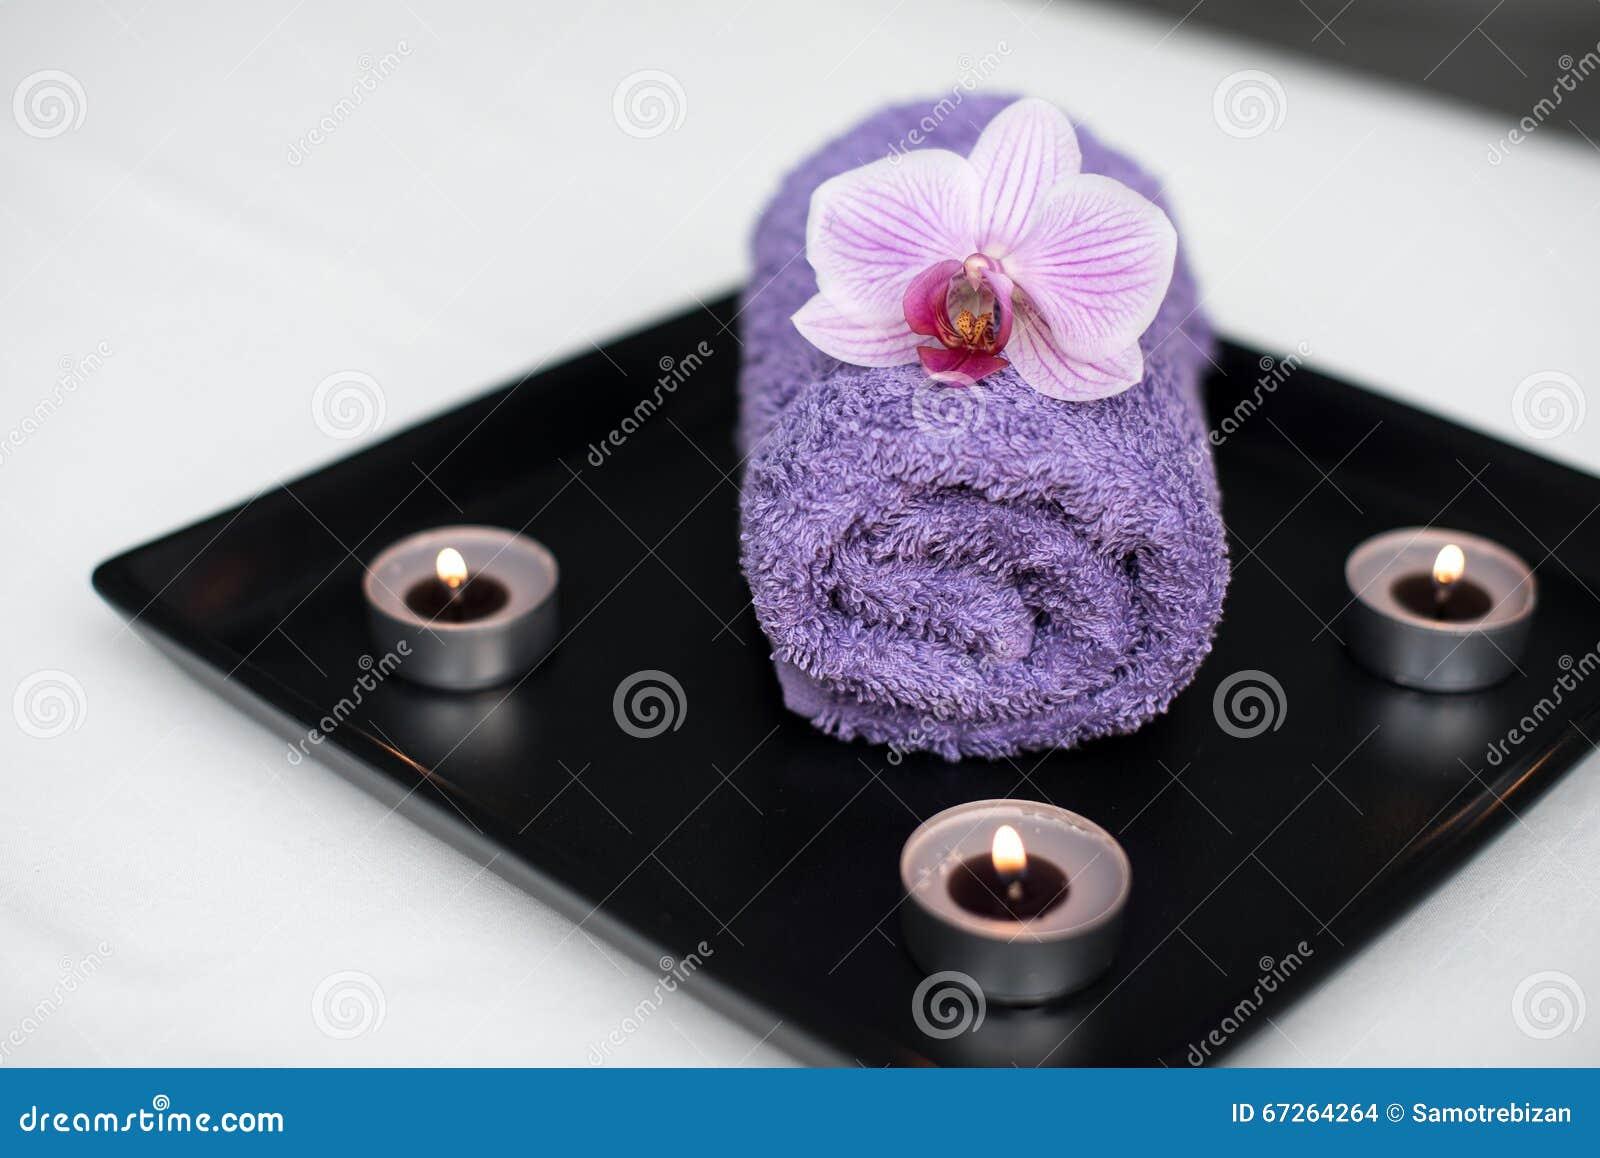 Beauty salon decoration in massage room candles towel - Photo decoration salon ...